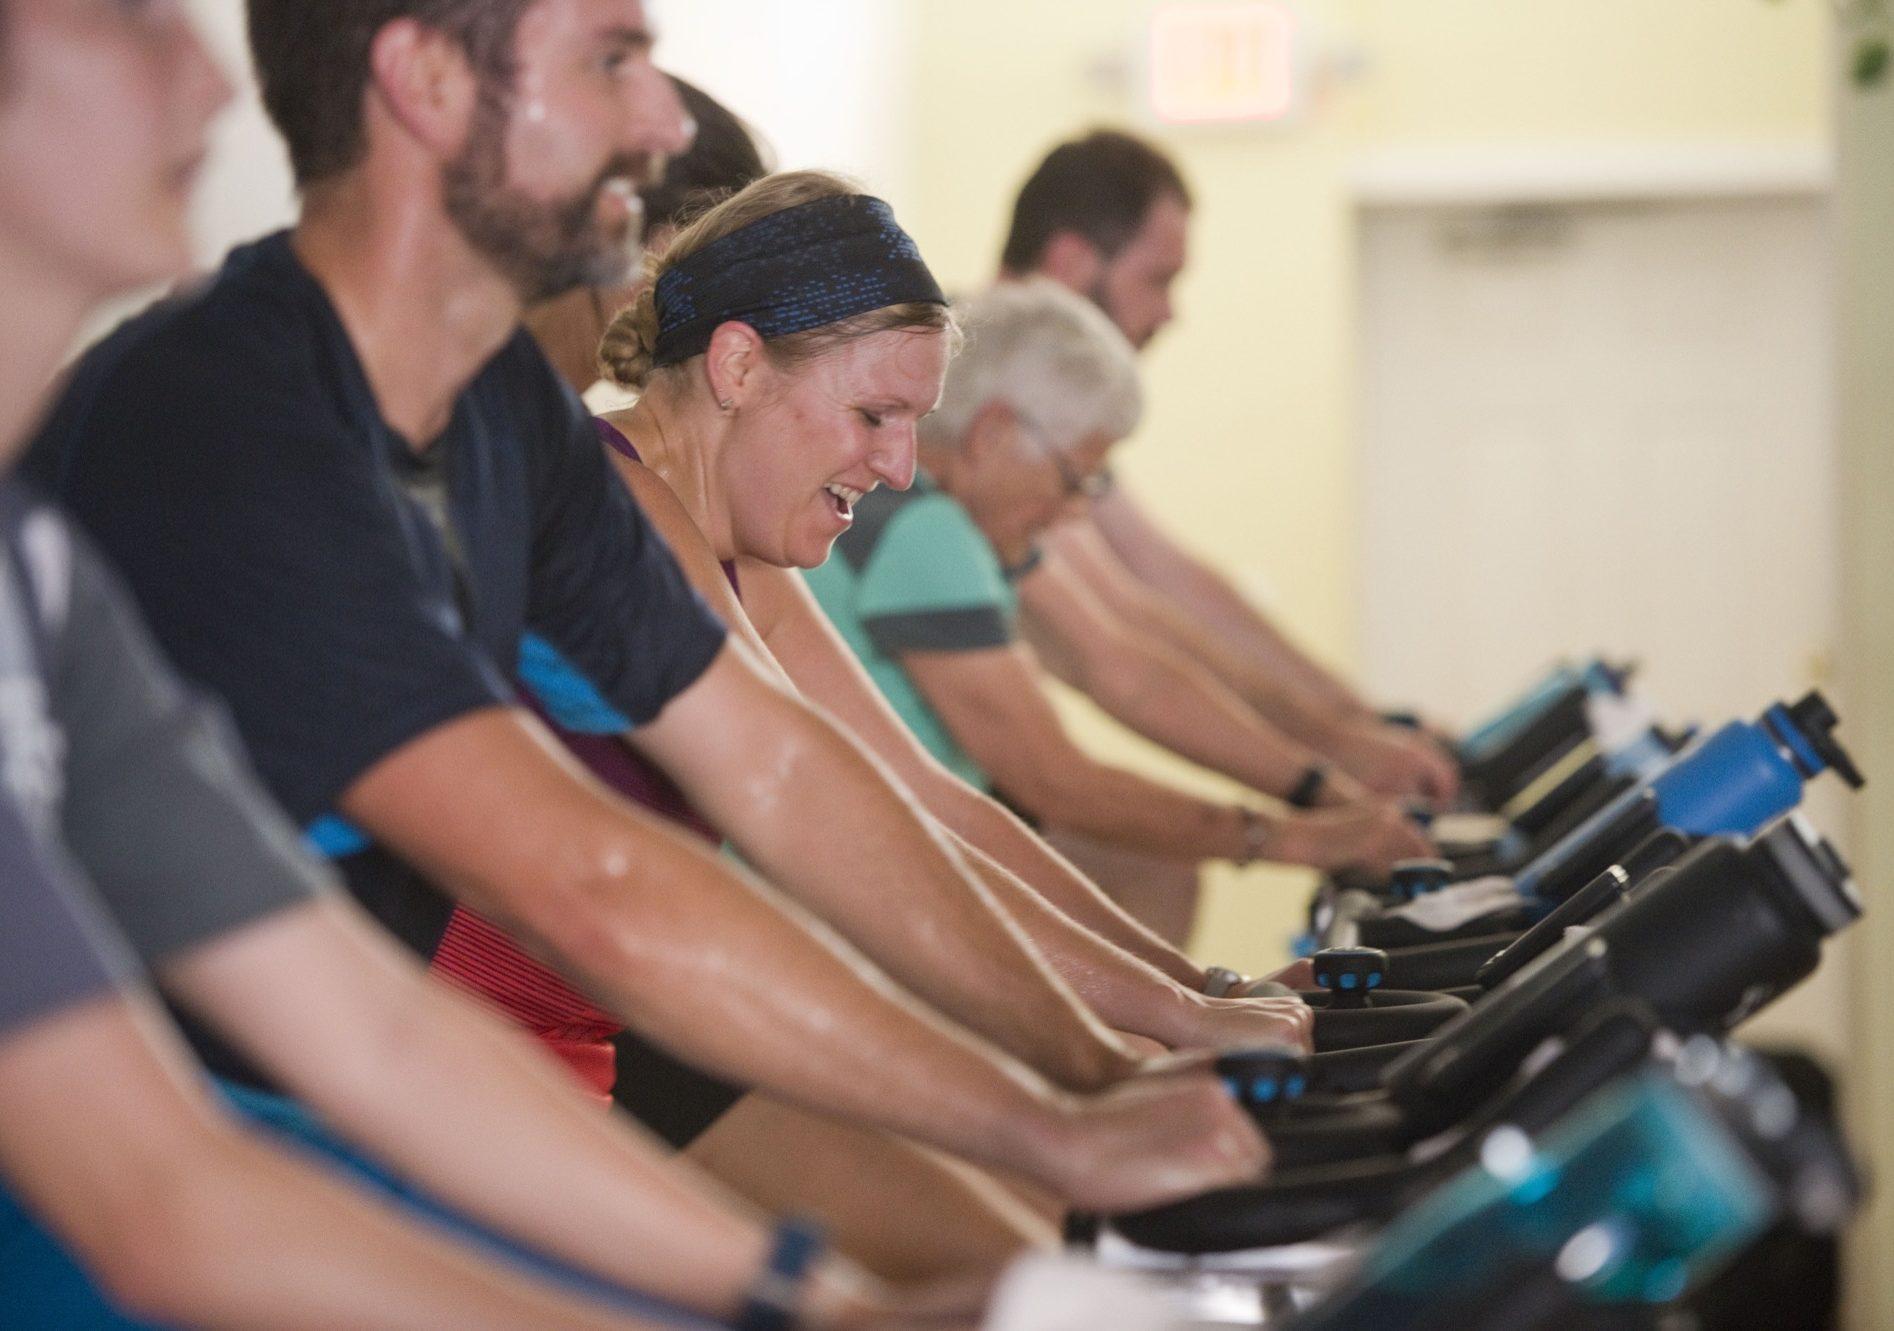 Cardio class high intensity workout